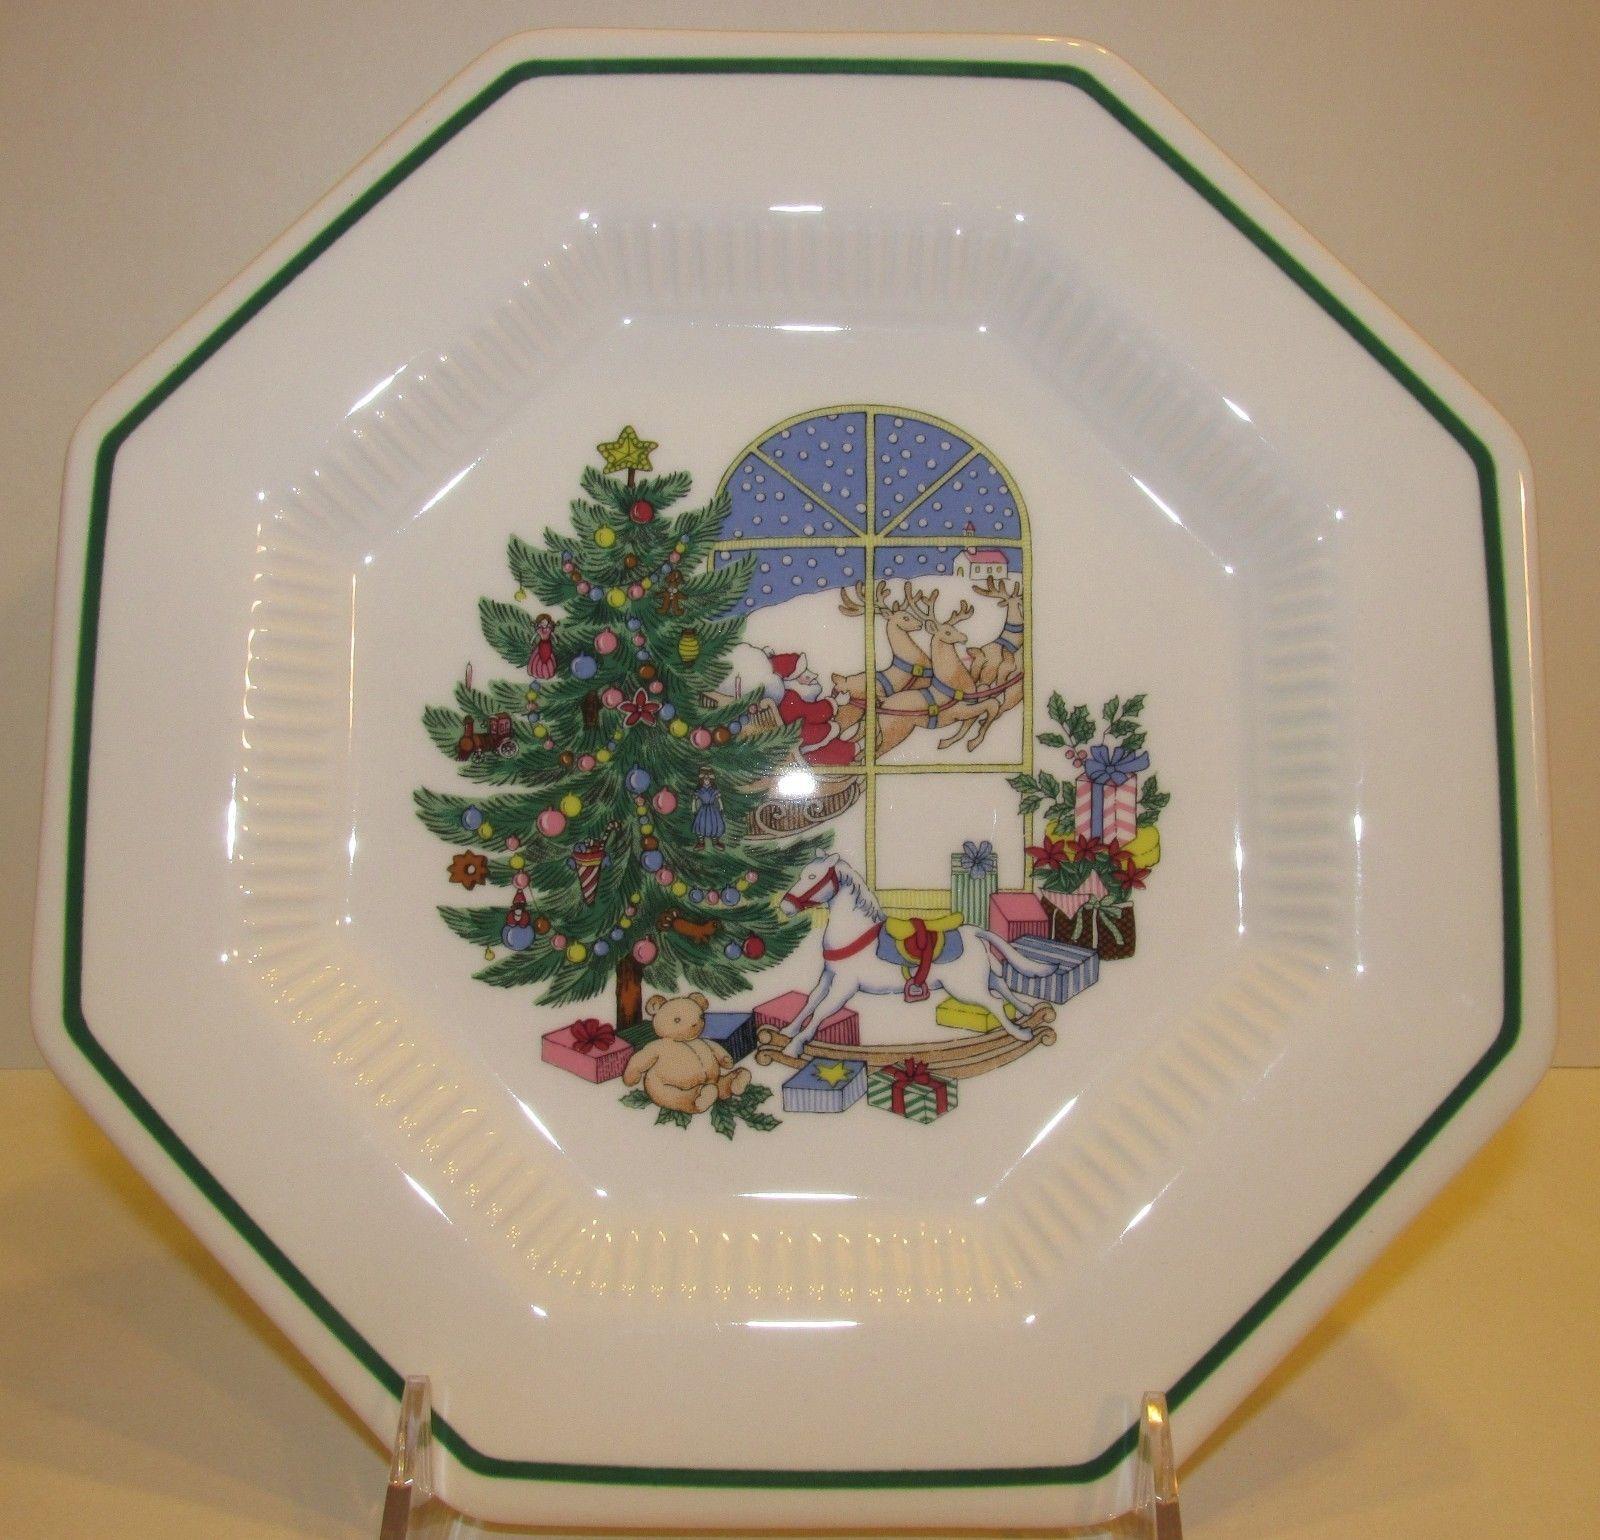 Amazing Nikko Christmas Dinnerware Sets Images - Best Image Engine ...